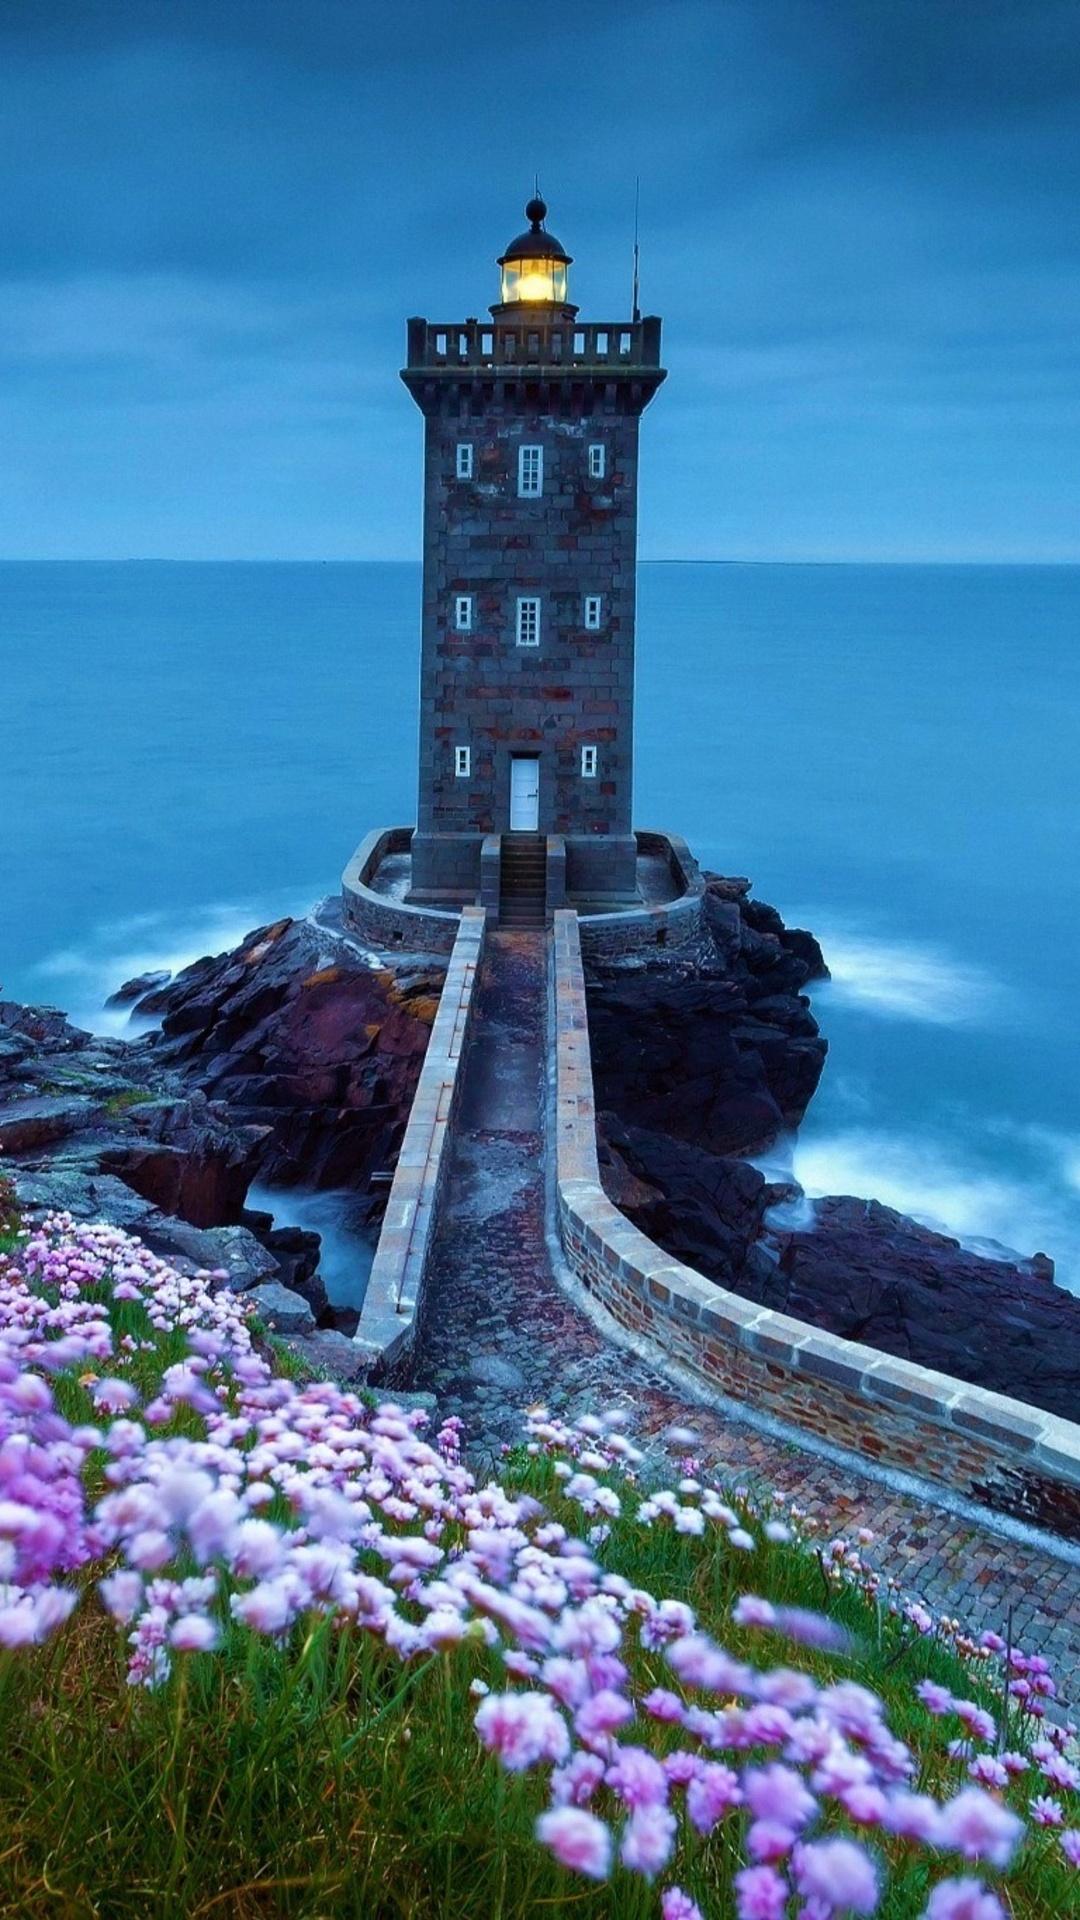 1080x1920 Lighthouse Spring Iphone 7 6s 6 Plus Pixel xl e Plus 3